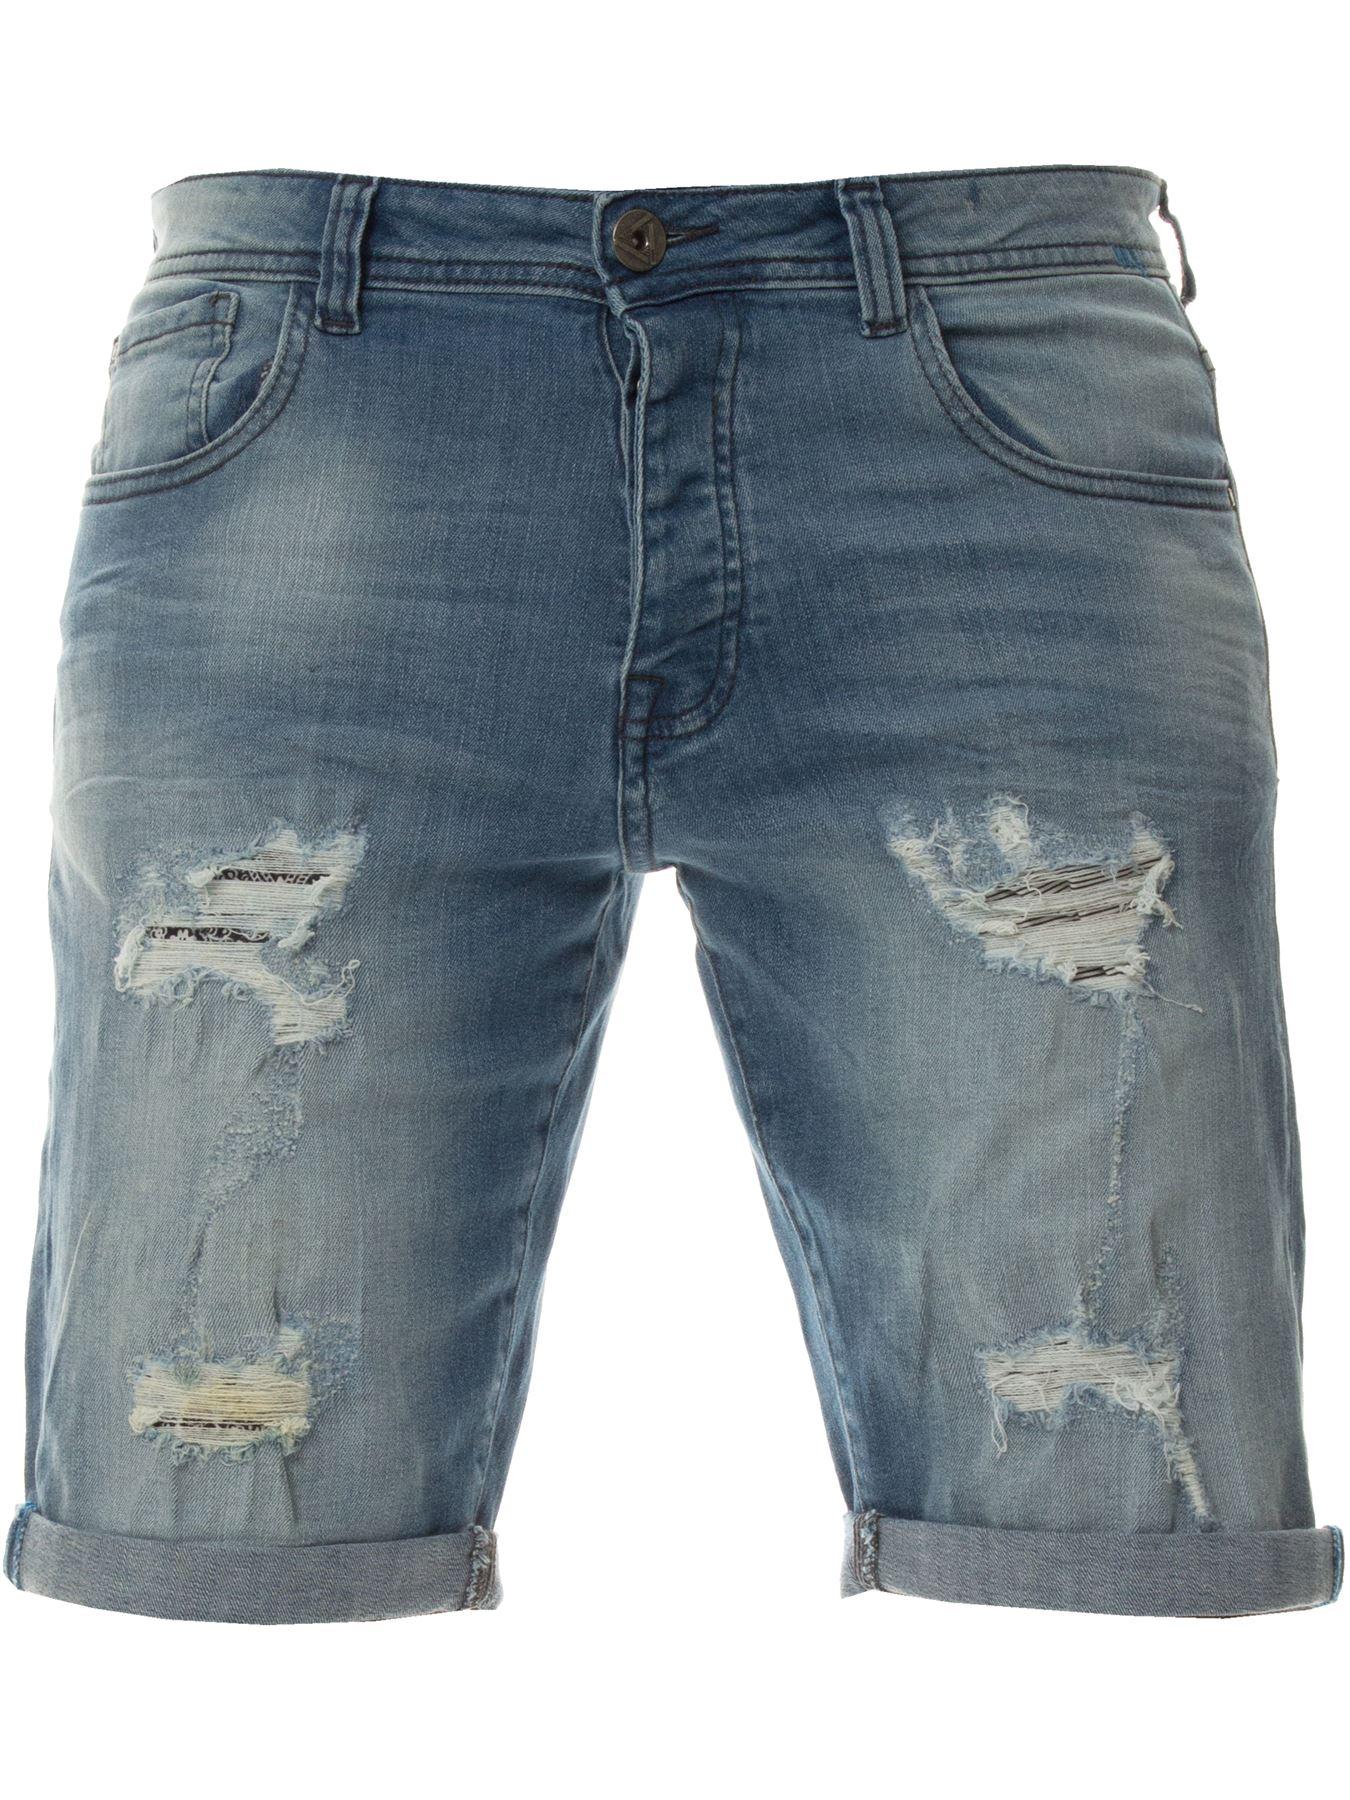 Mens-Denim-Shorts-ETO-Jeans-Stretch-Slim-Fit-Distressed-Ripped-Blue-Half-Pants thumbnail 9